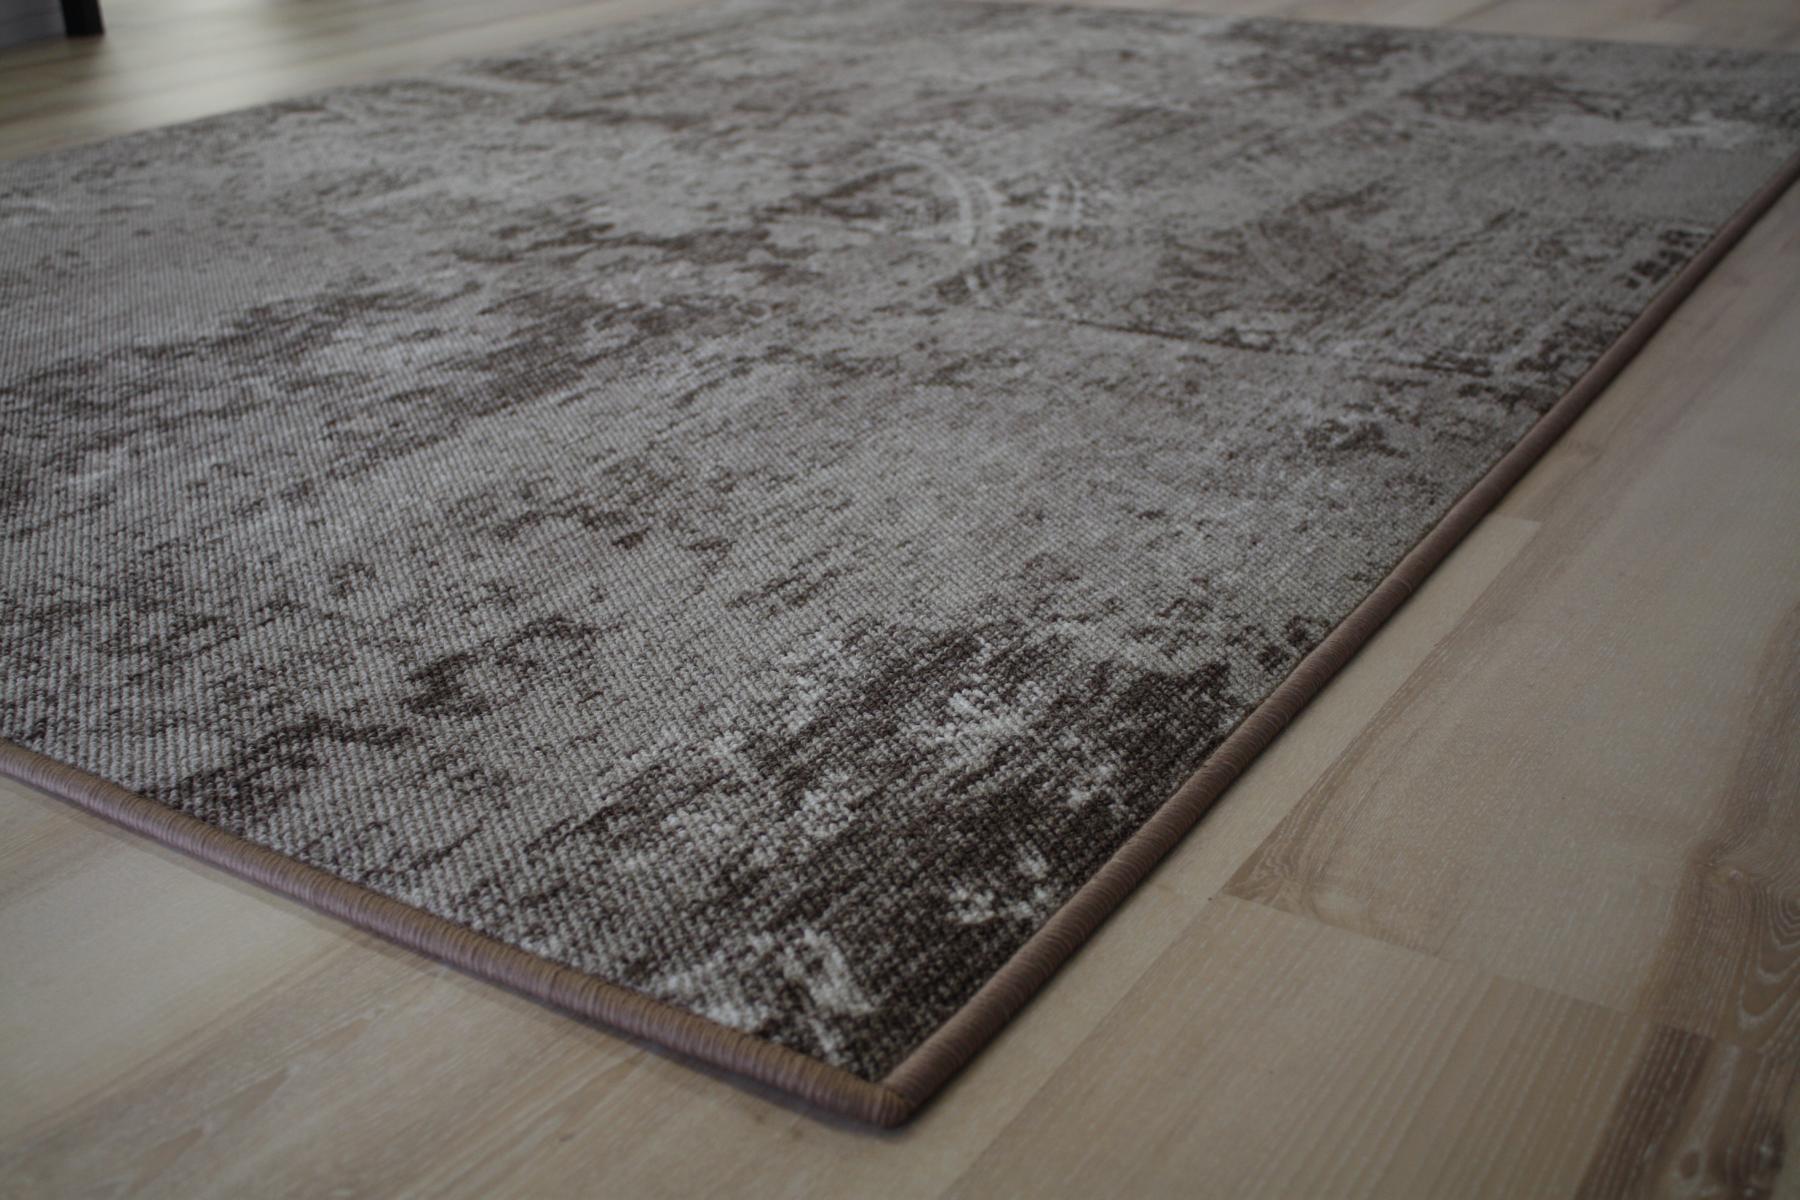 Patchwork tappeto pavimento tappeto beige 200x200 cm ebay - Tappeto riscaldamento pavimento ...